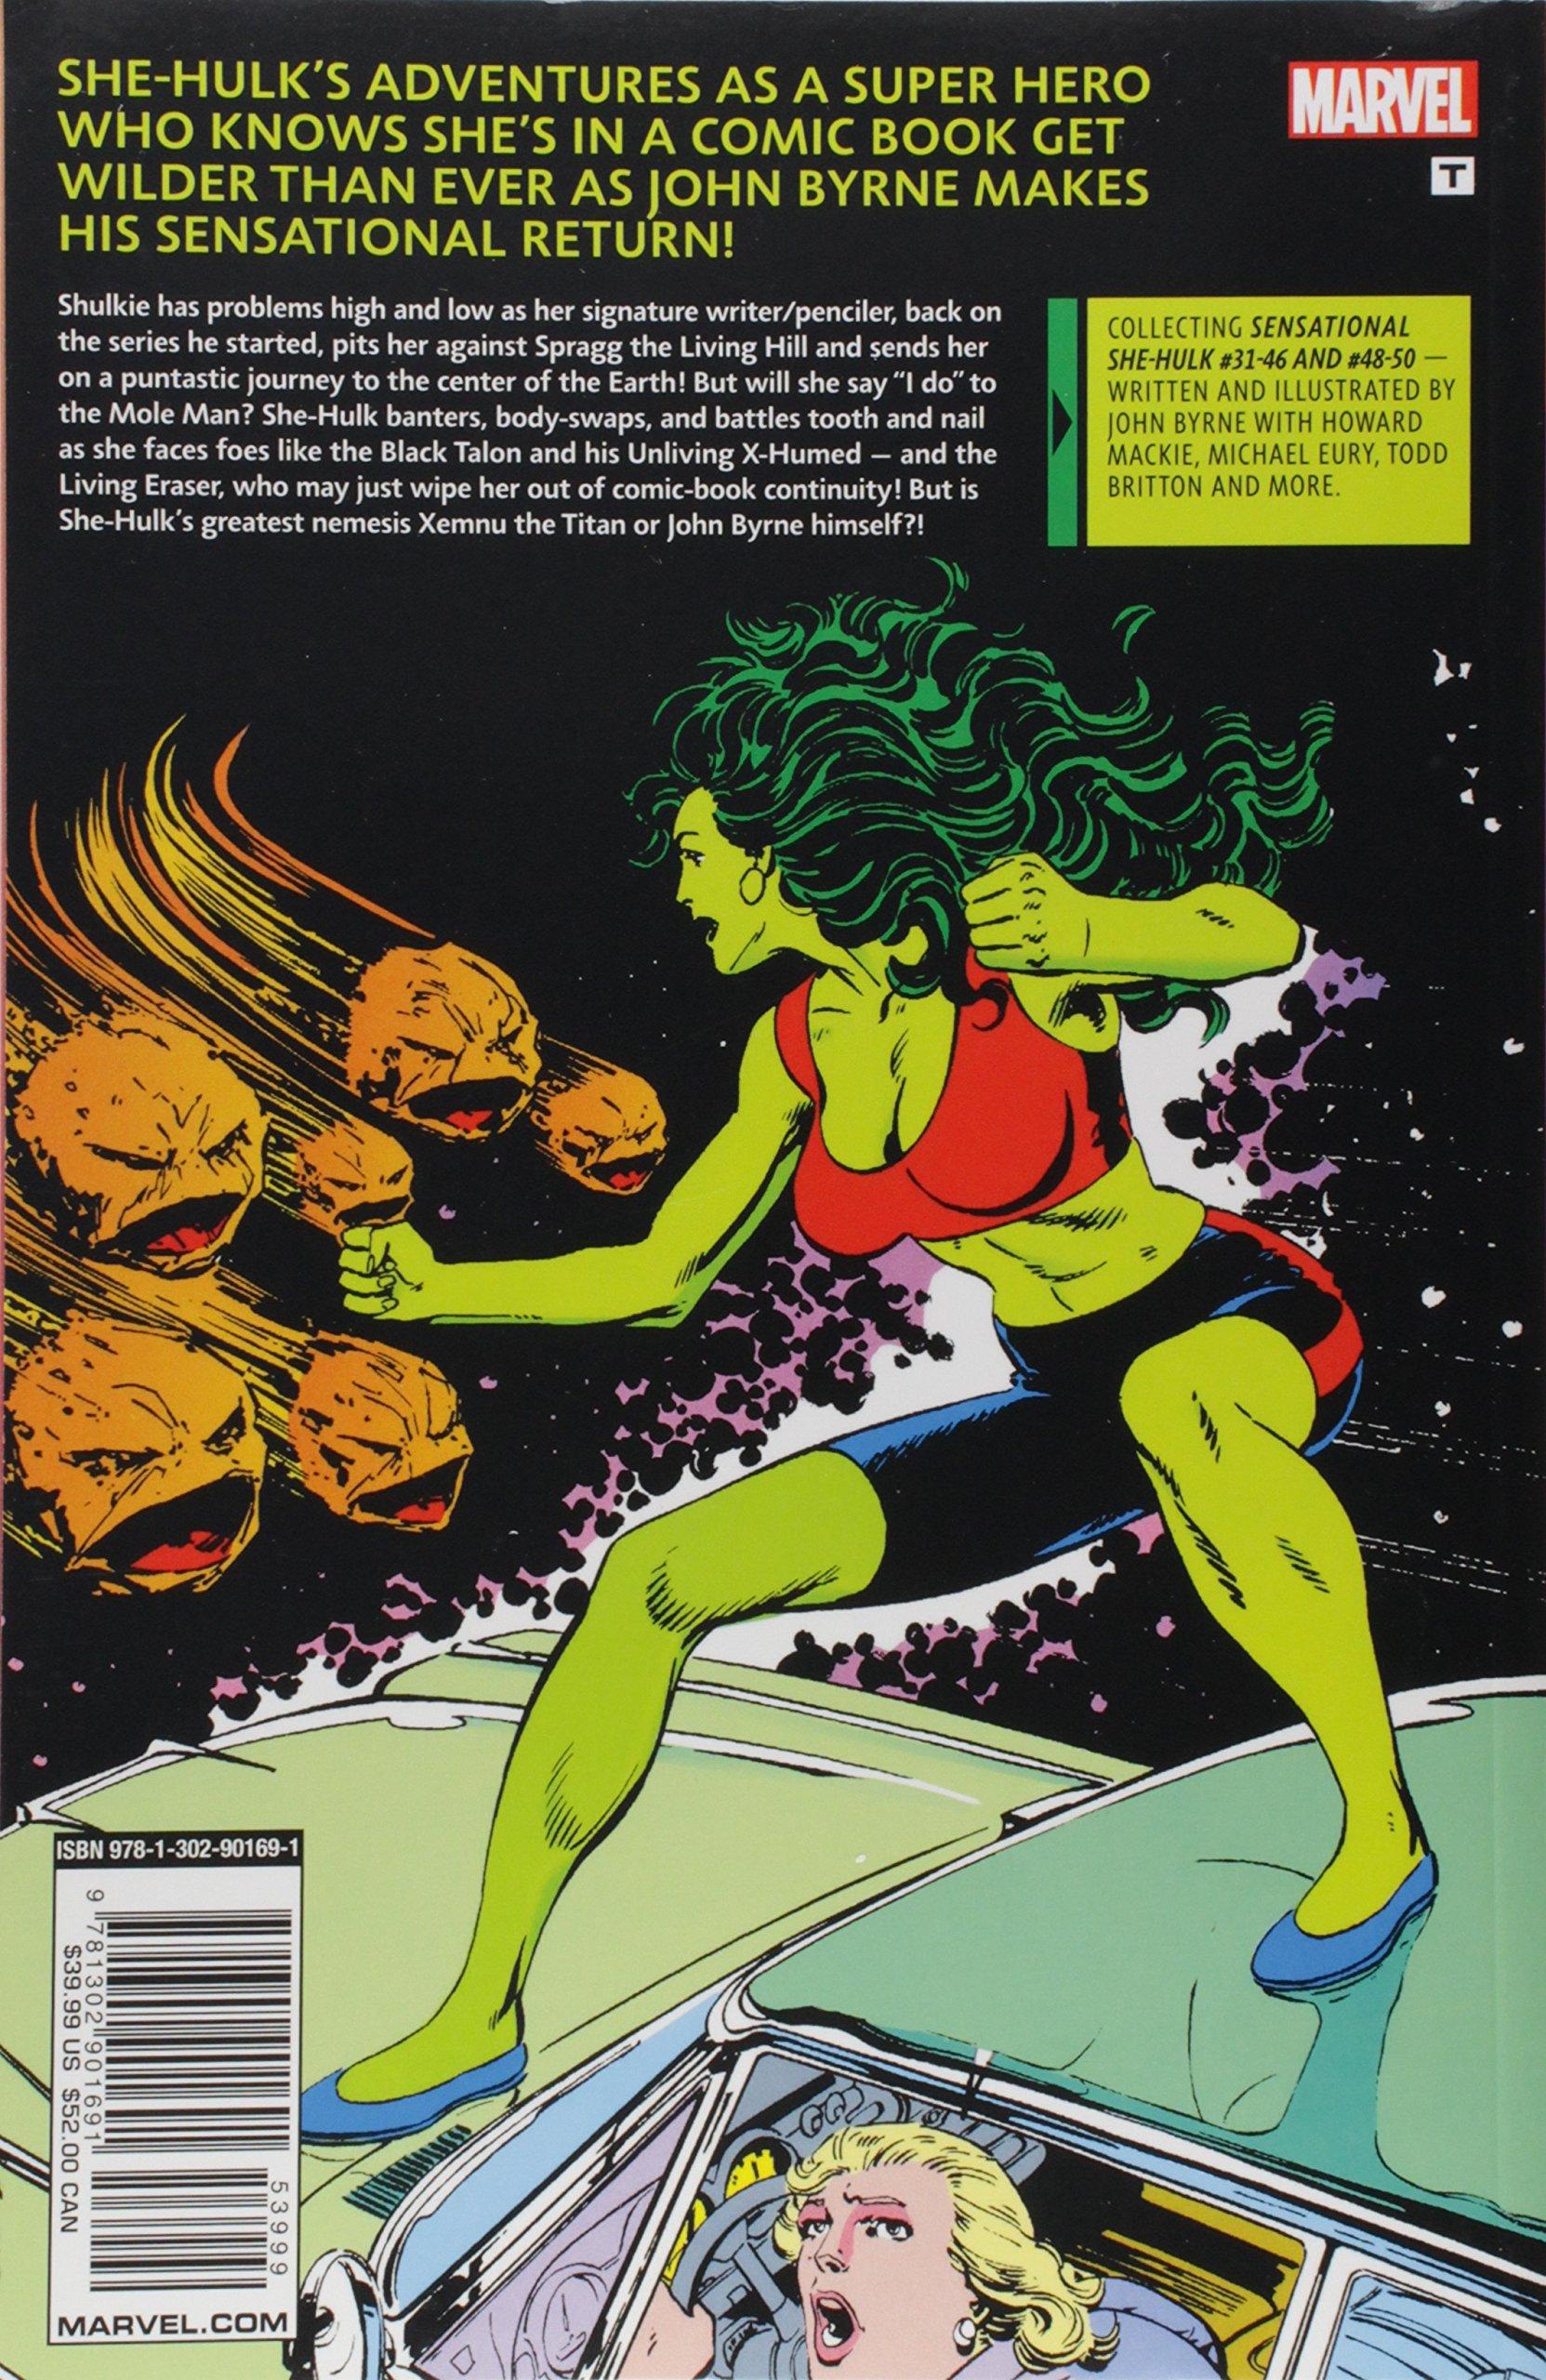 Amazon.com: Sensational She-Hulk by John Byrne: The Return (The Sensational She-Hulk) (9781302901691): John Byrne, Howard Mackie, Michael Eury, ...